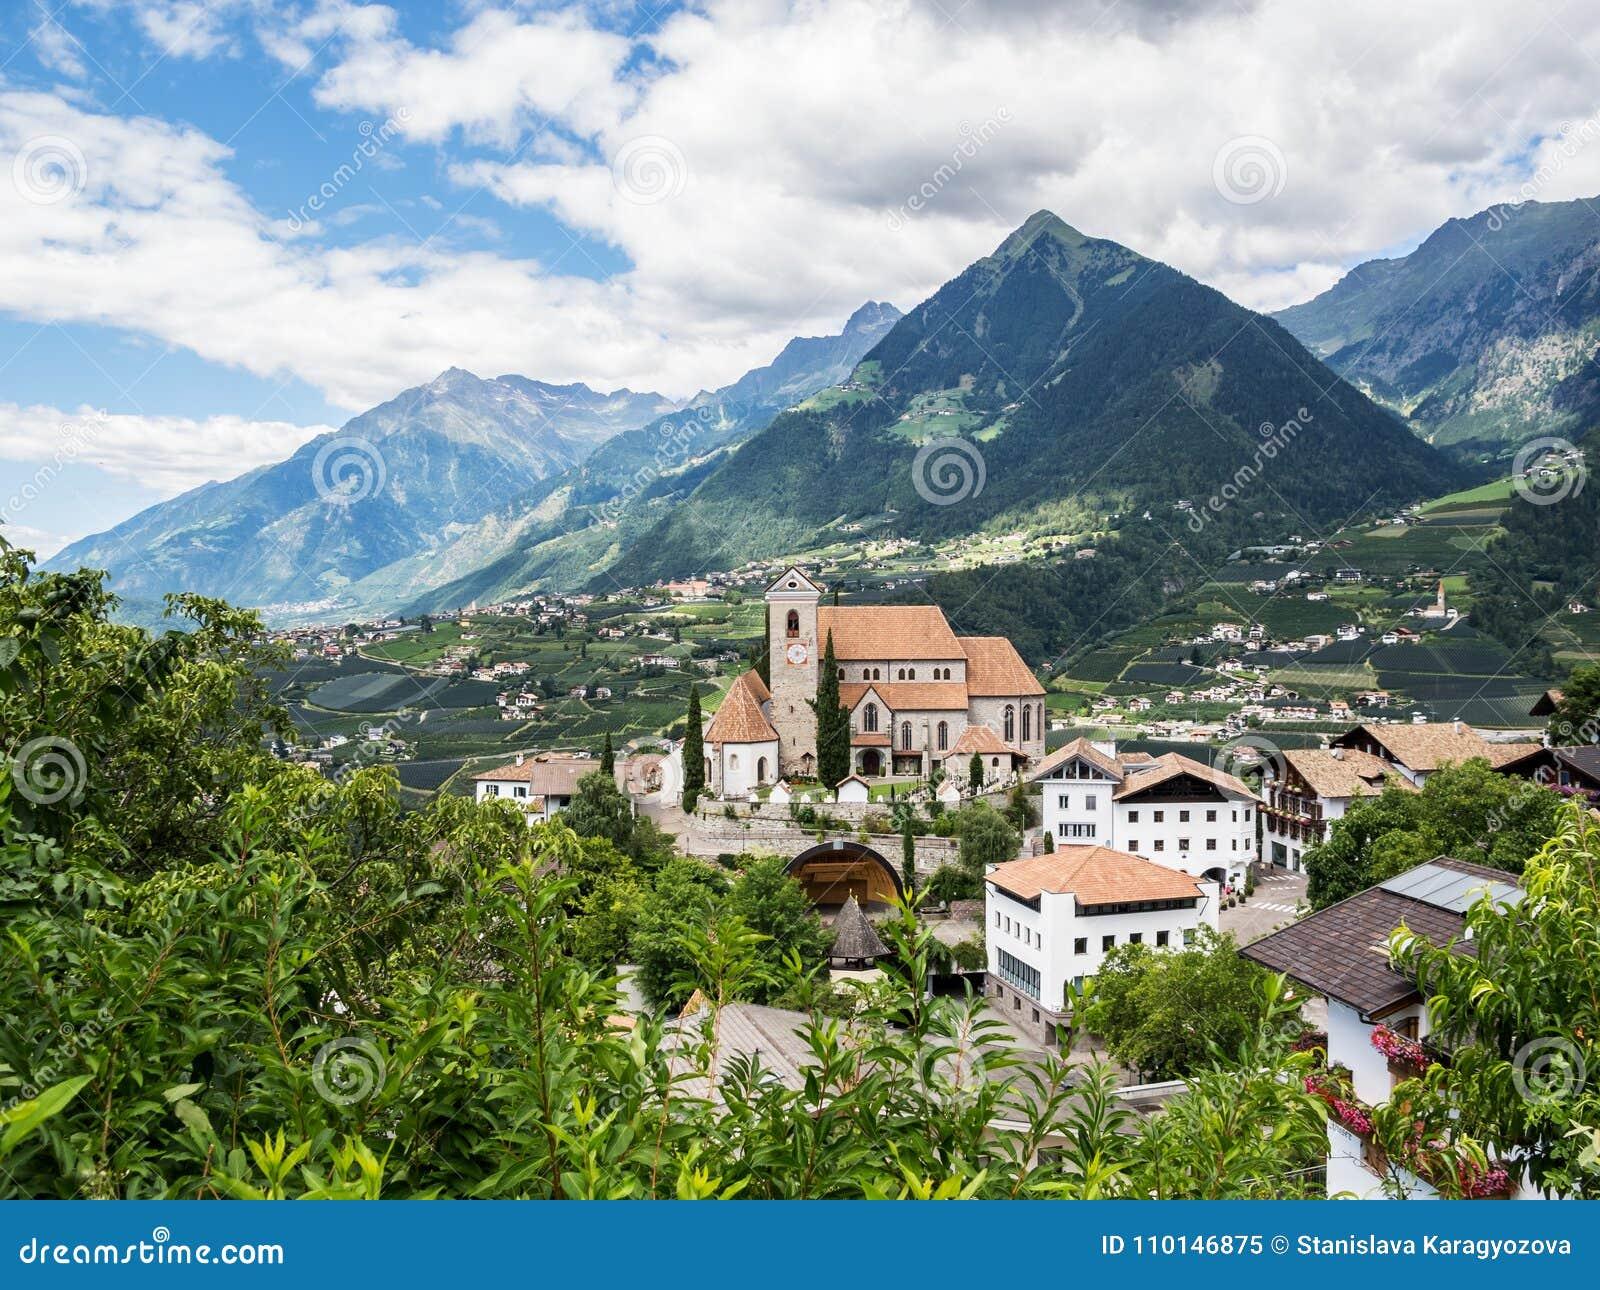 Picturesque elevated view to Scena, Merano - Italy